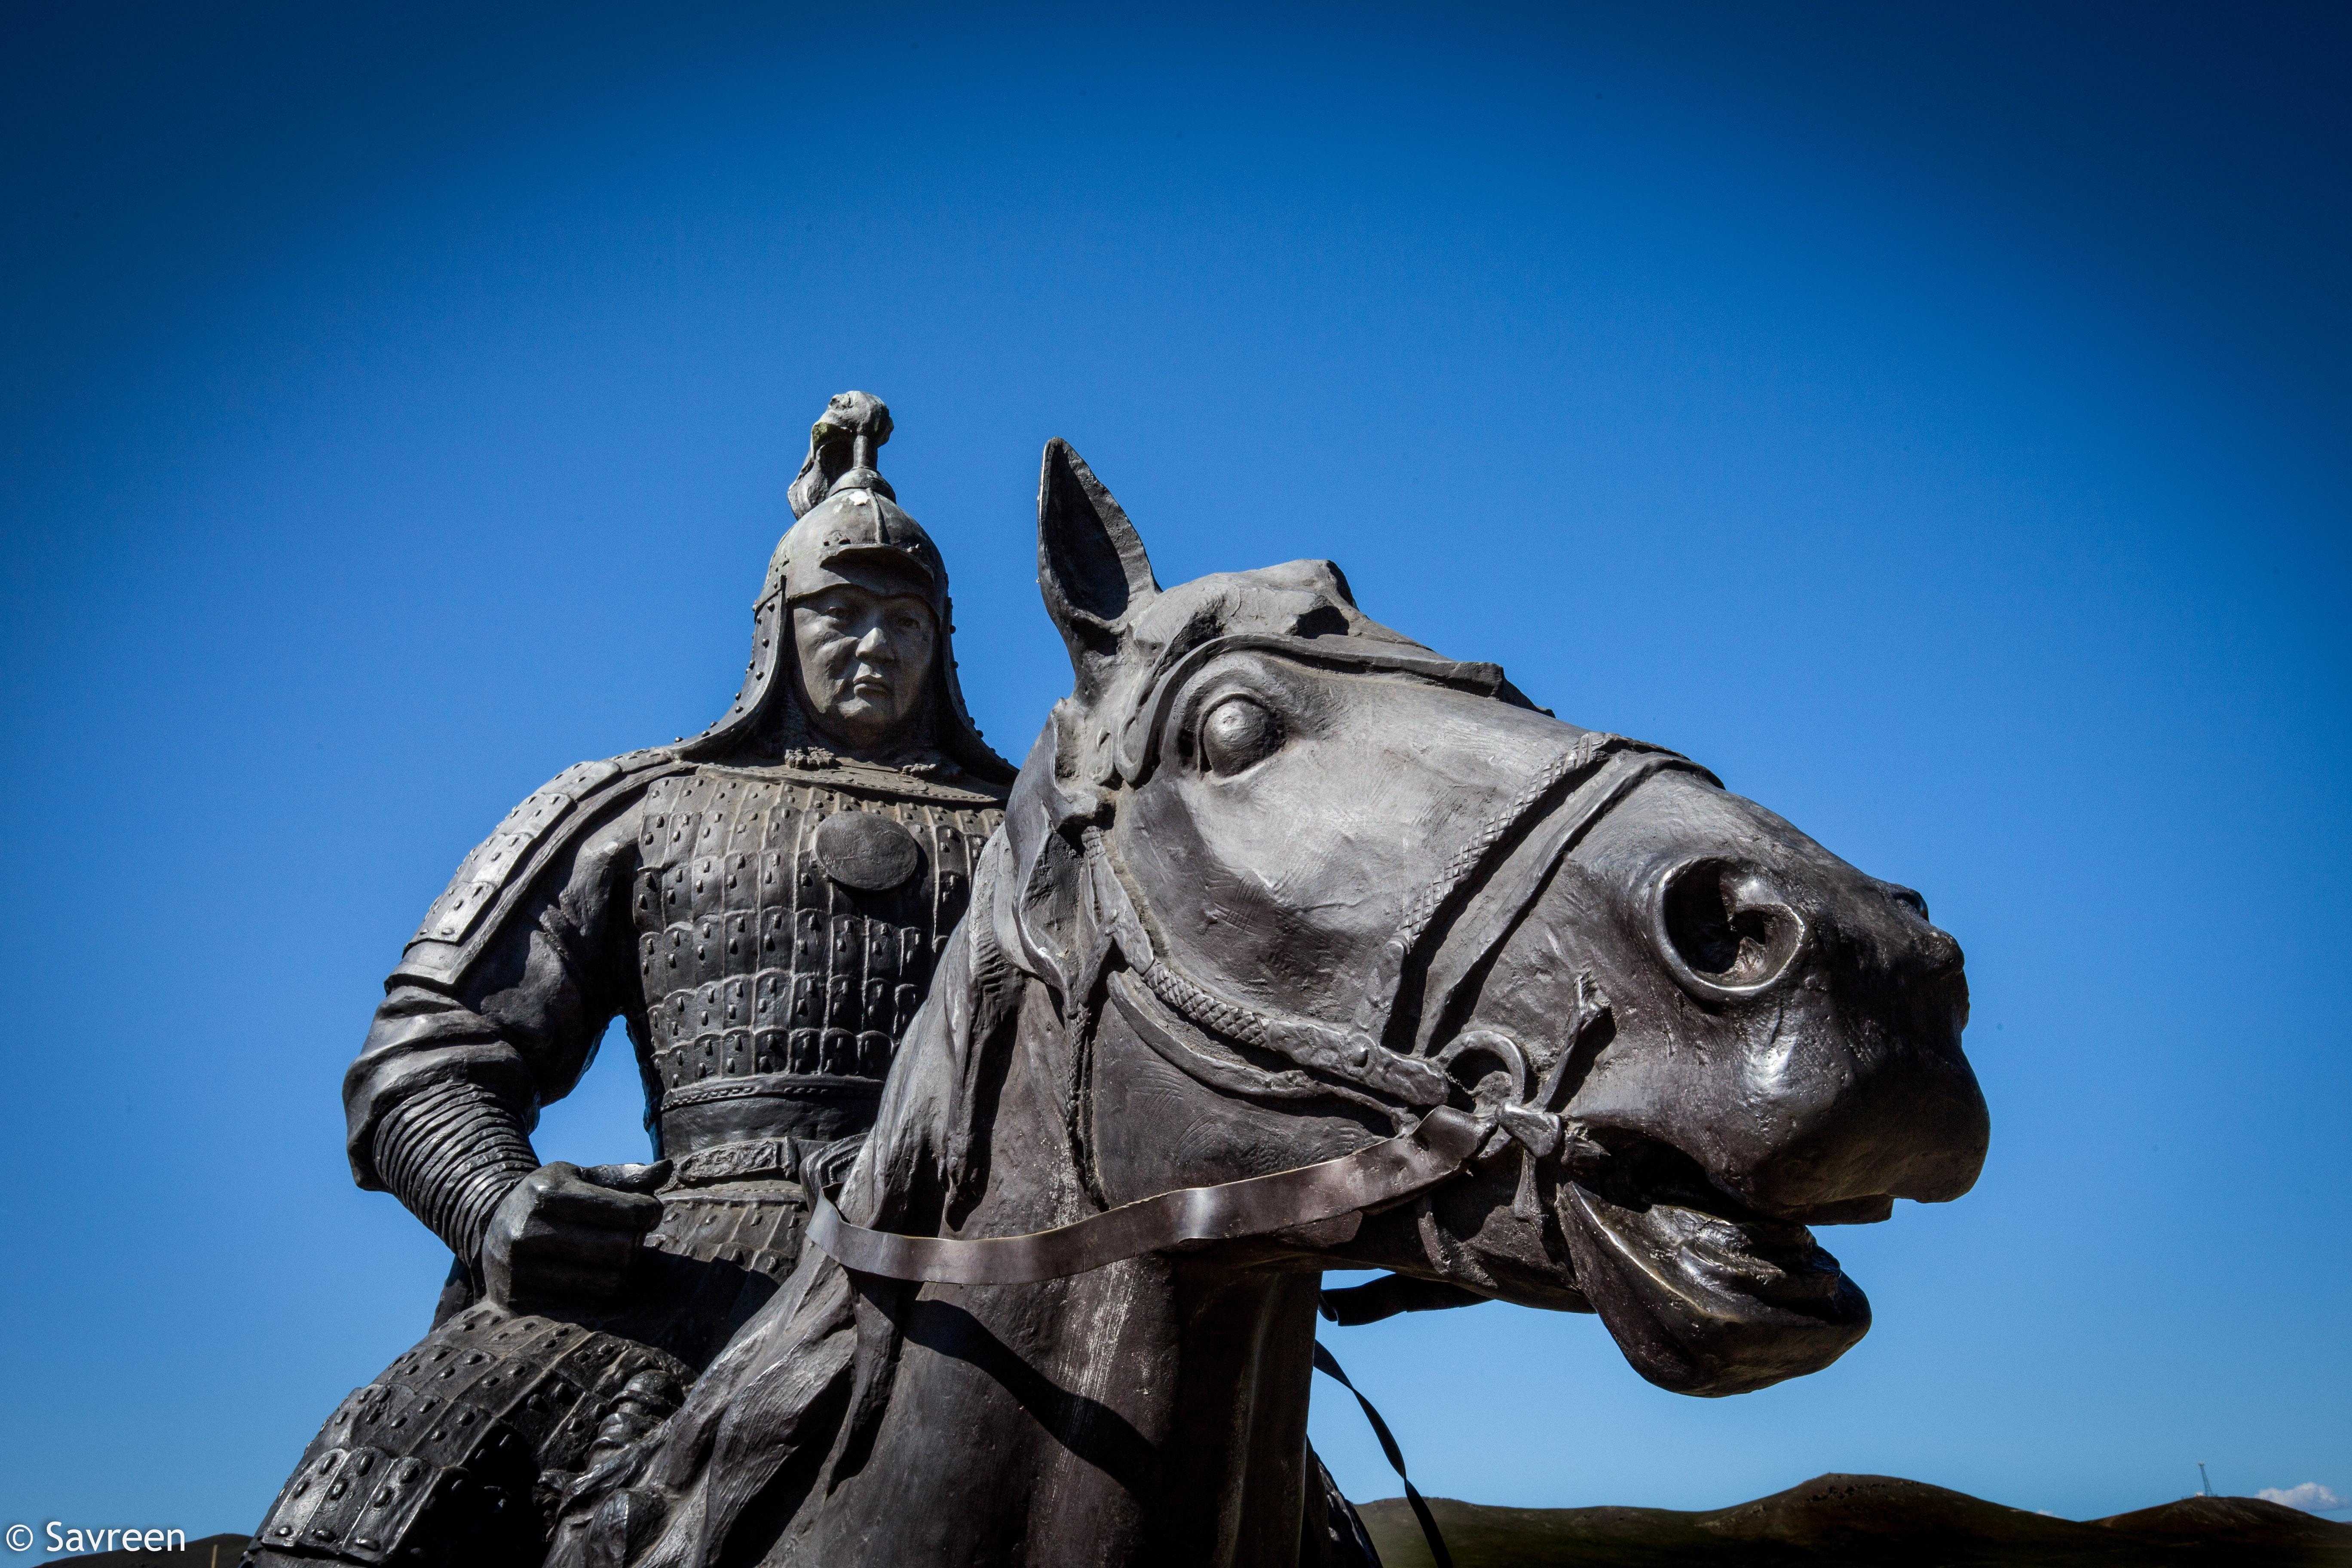 Chinggis Khan Statue